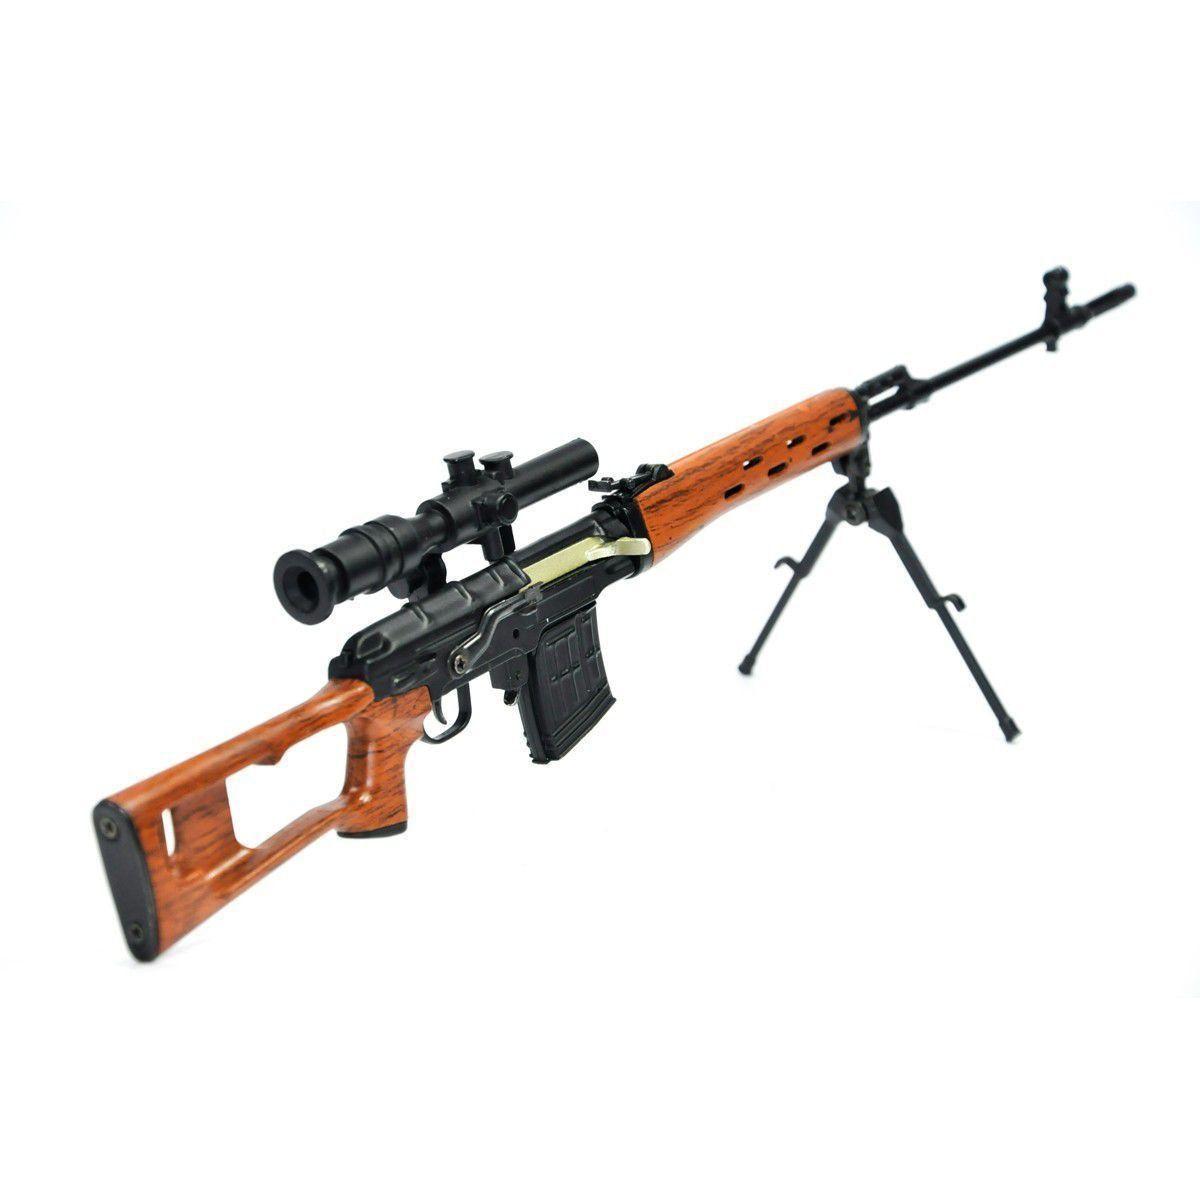 Miniatura Decorativa em Metal modelo Dragunov - Arsenal Guns